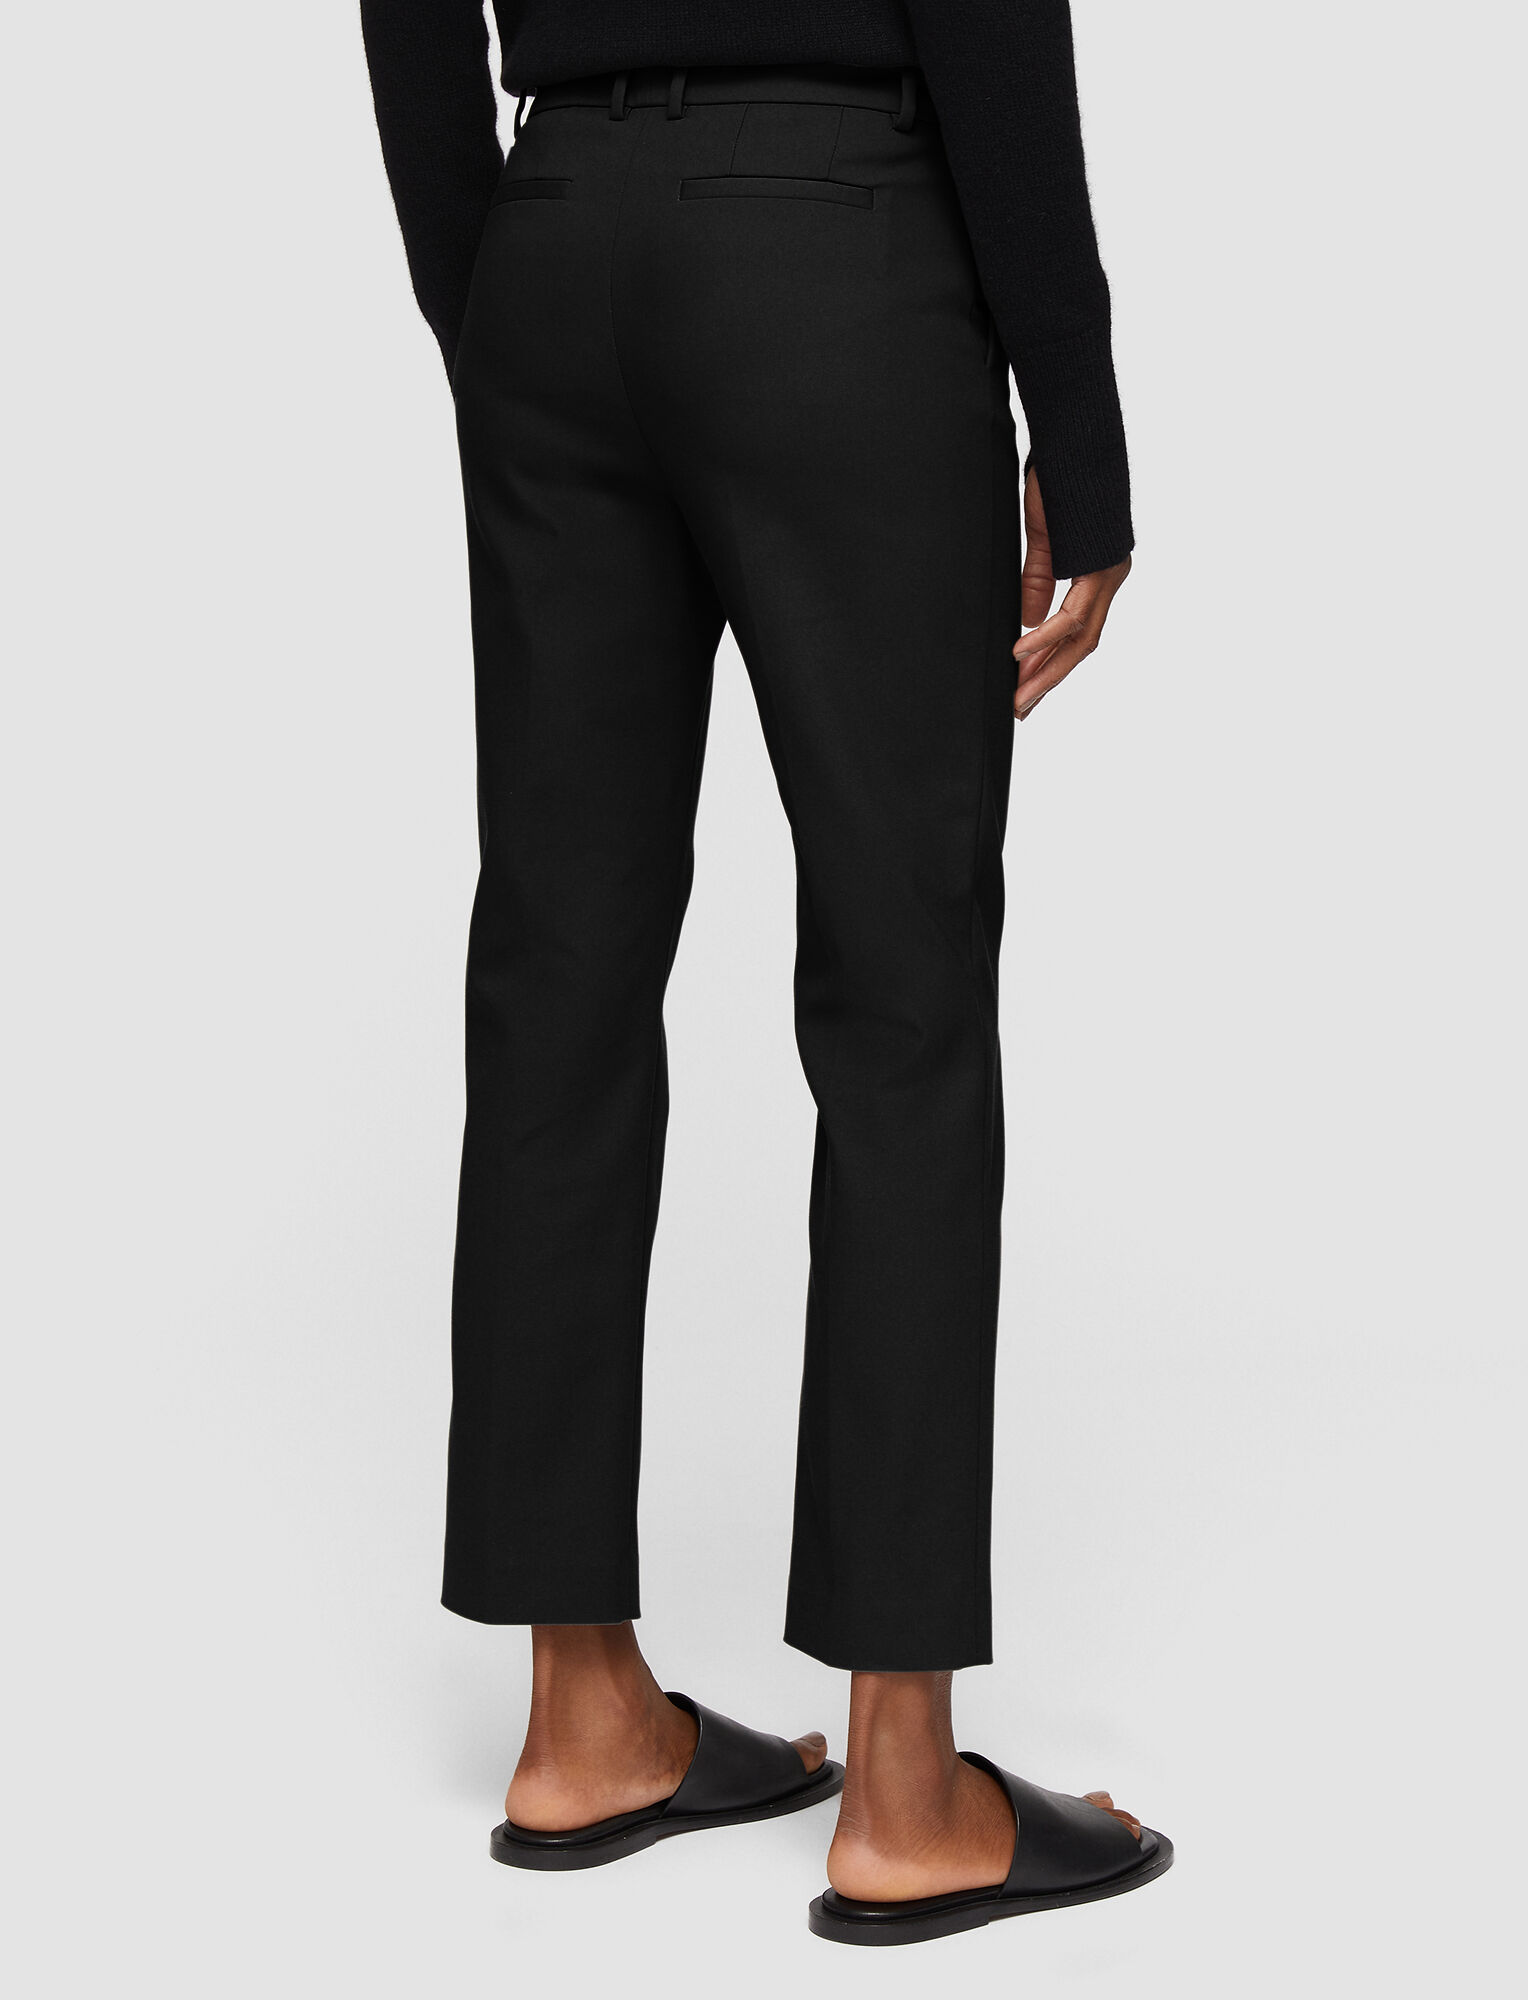 Joseph, Technical Cotton Coleman Trousers, in BLACK